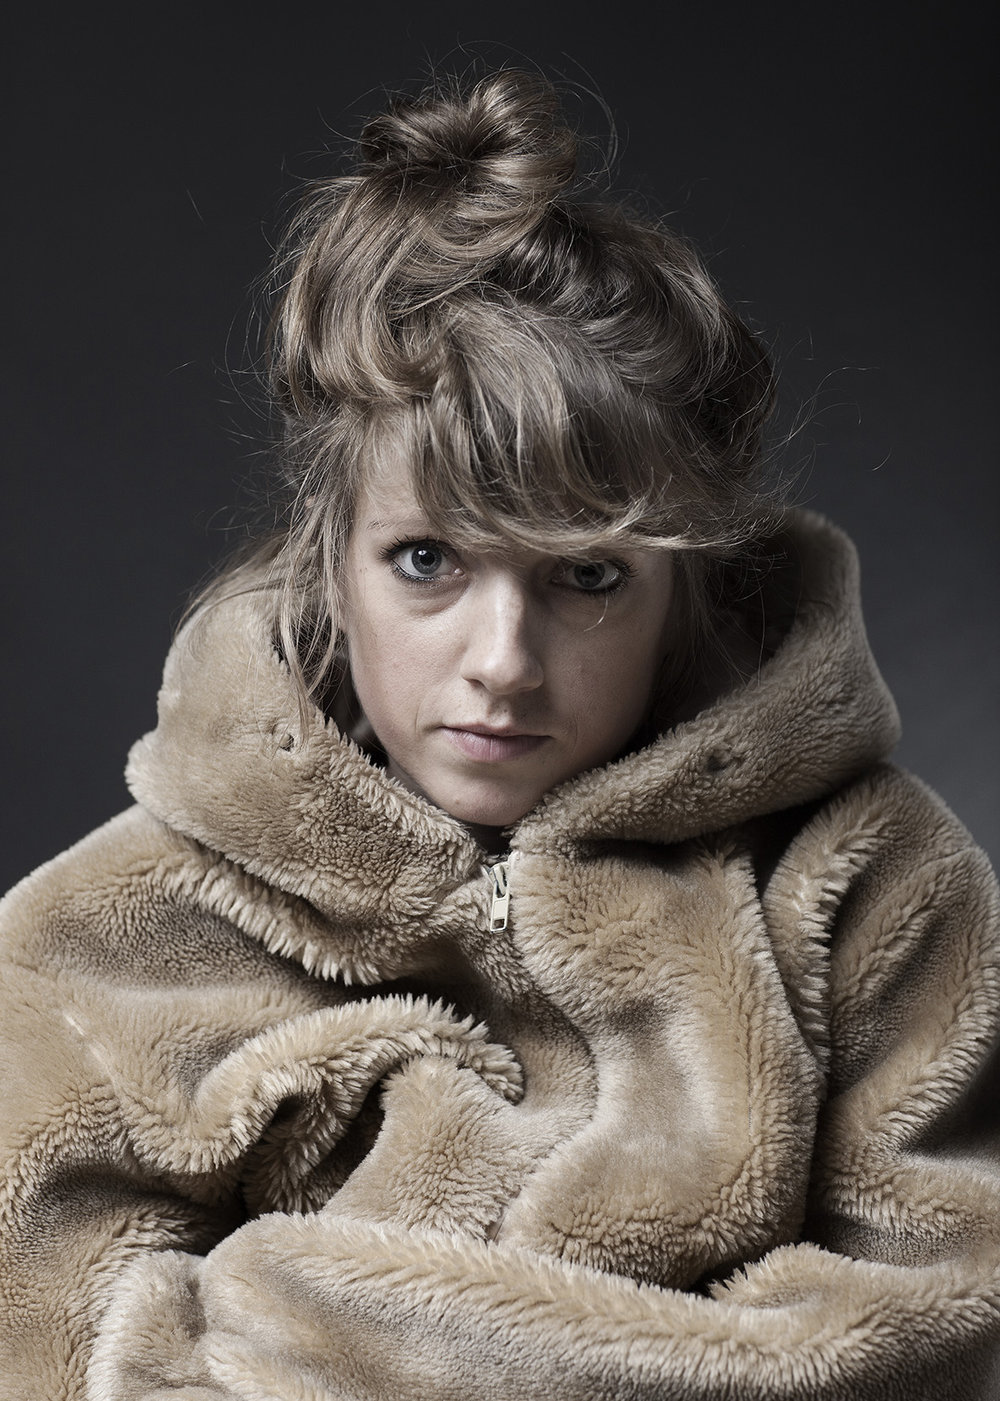 An-Sofie Kesteleyn